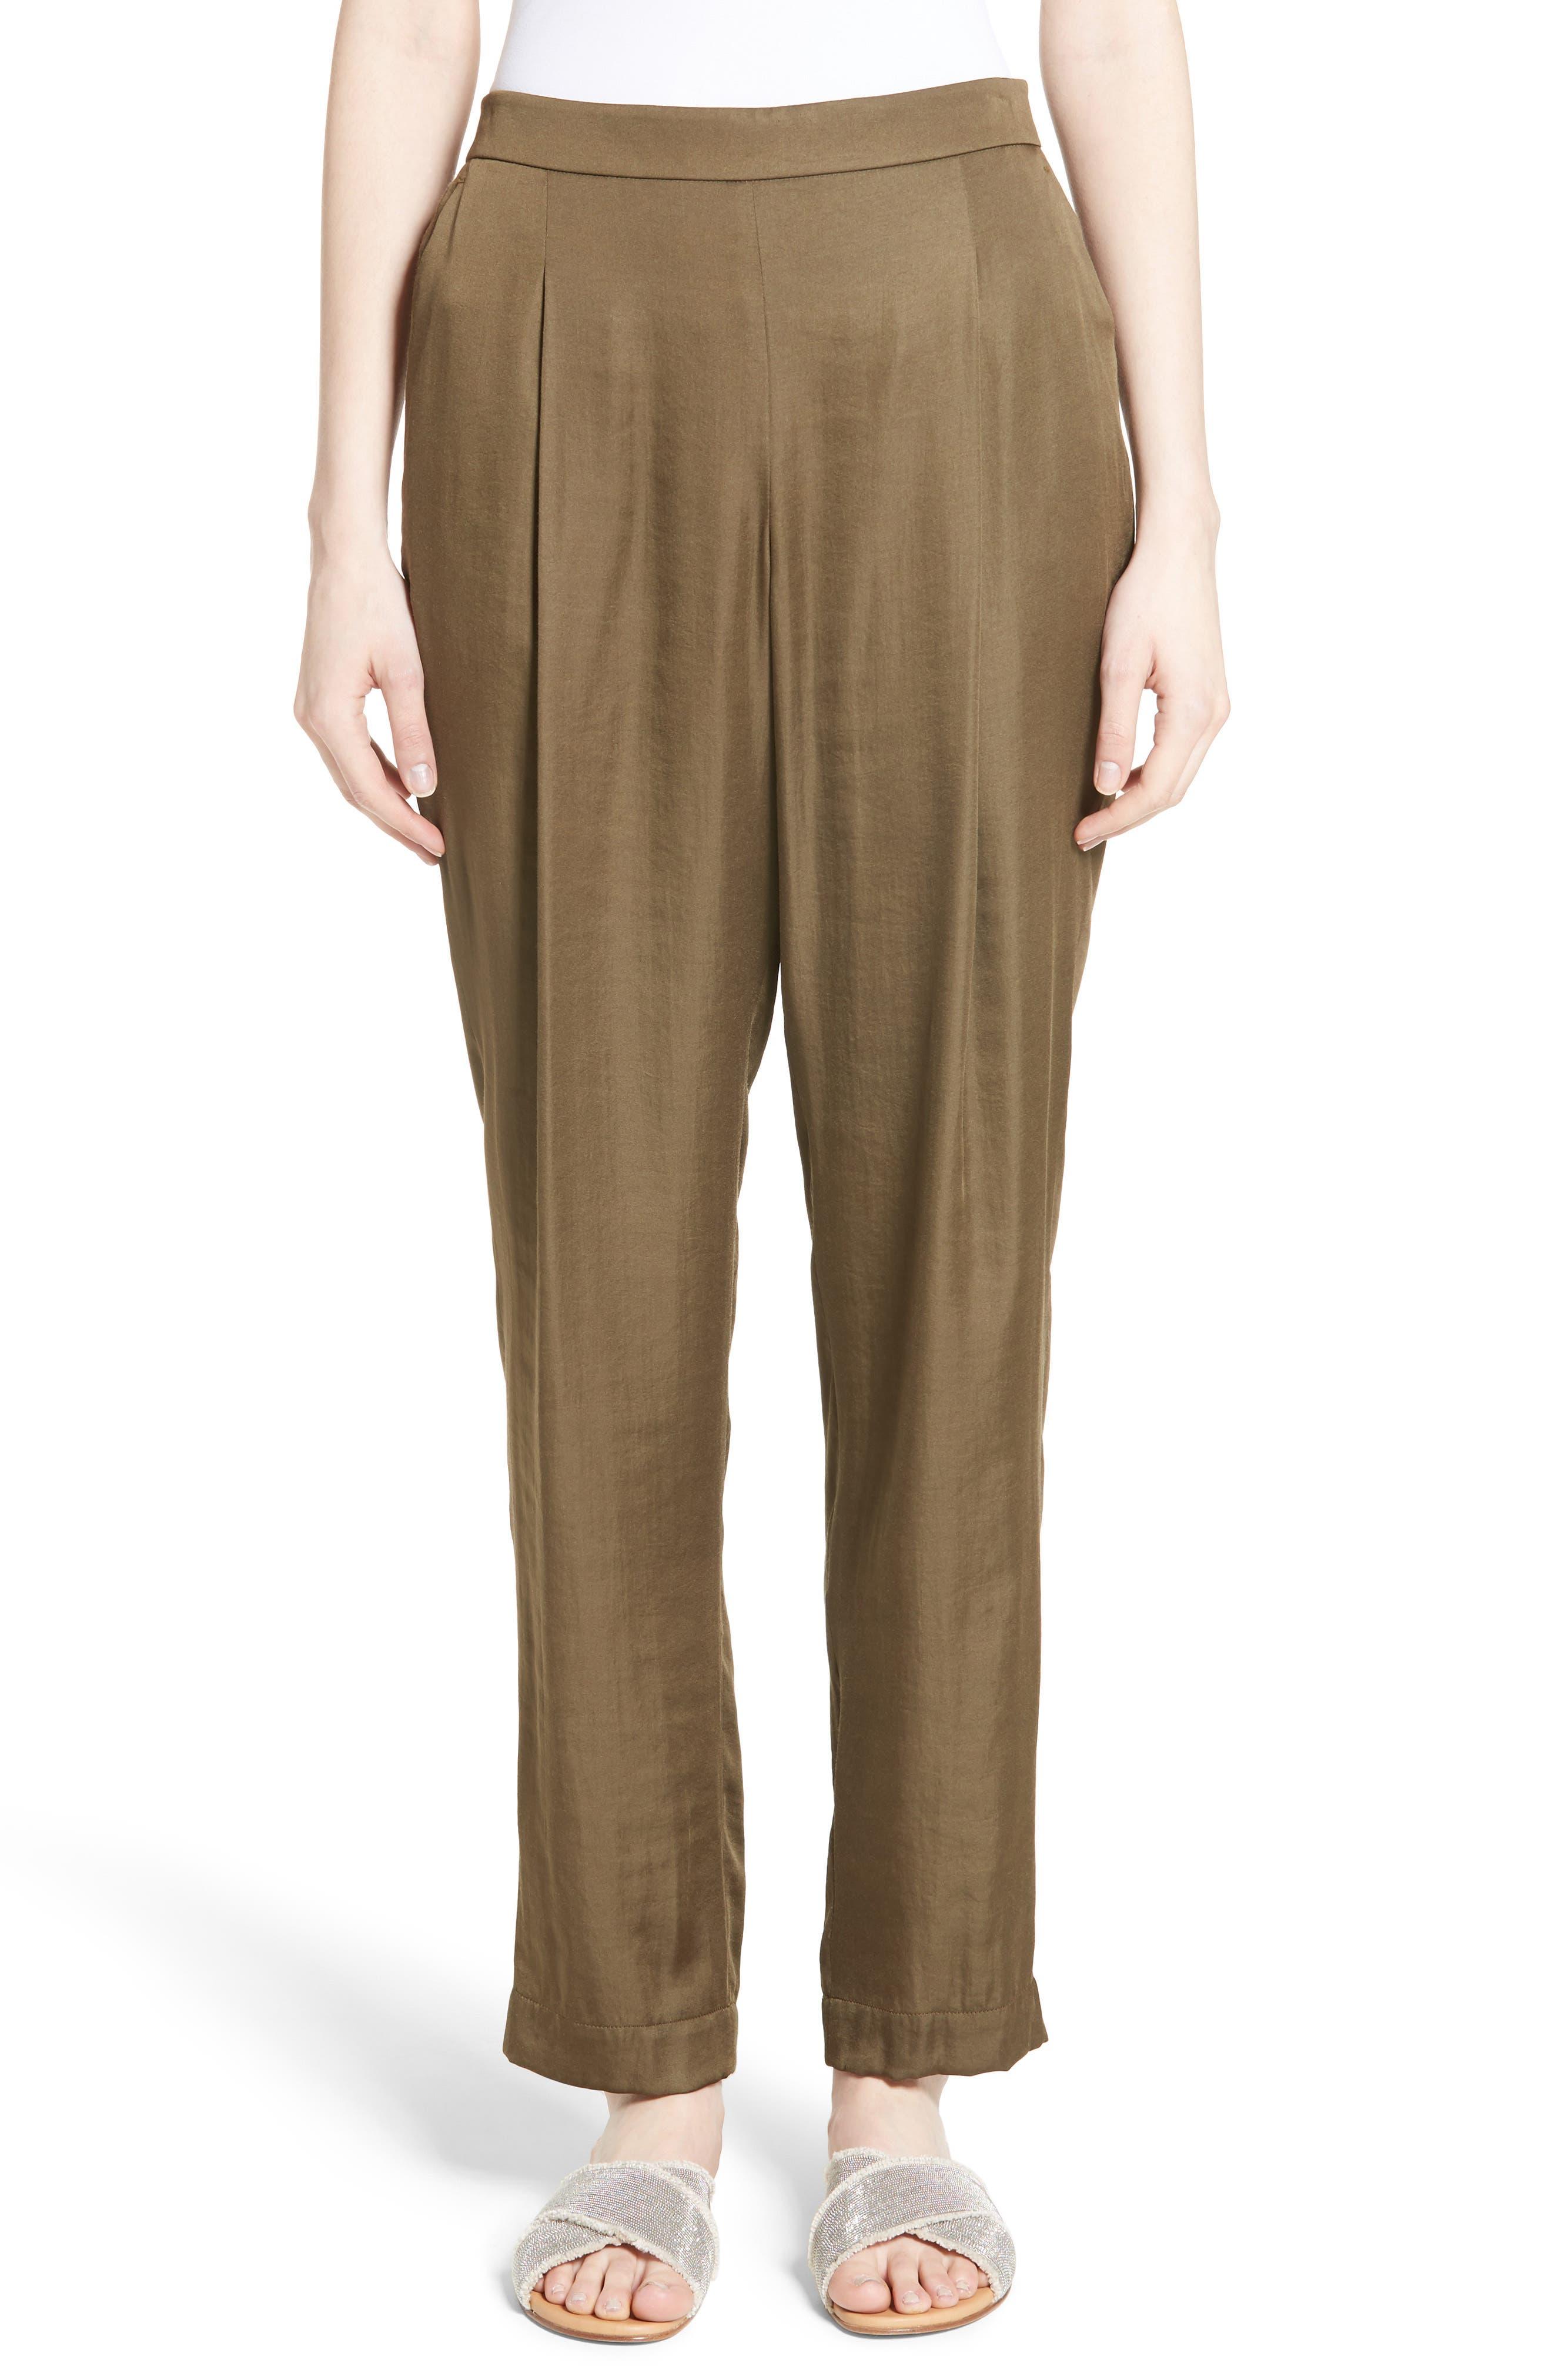 Soho Track Pants,                         Main,                         color, 399